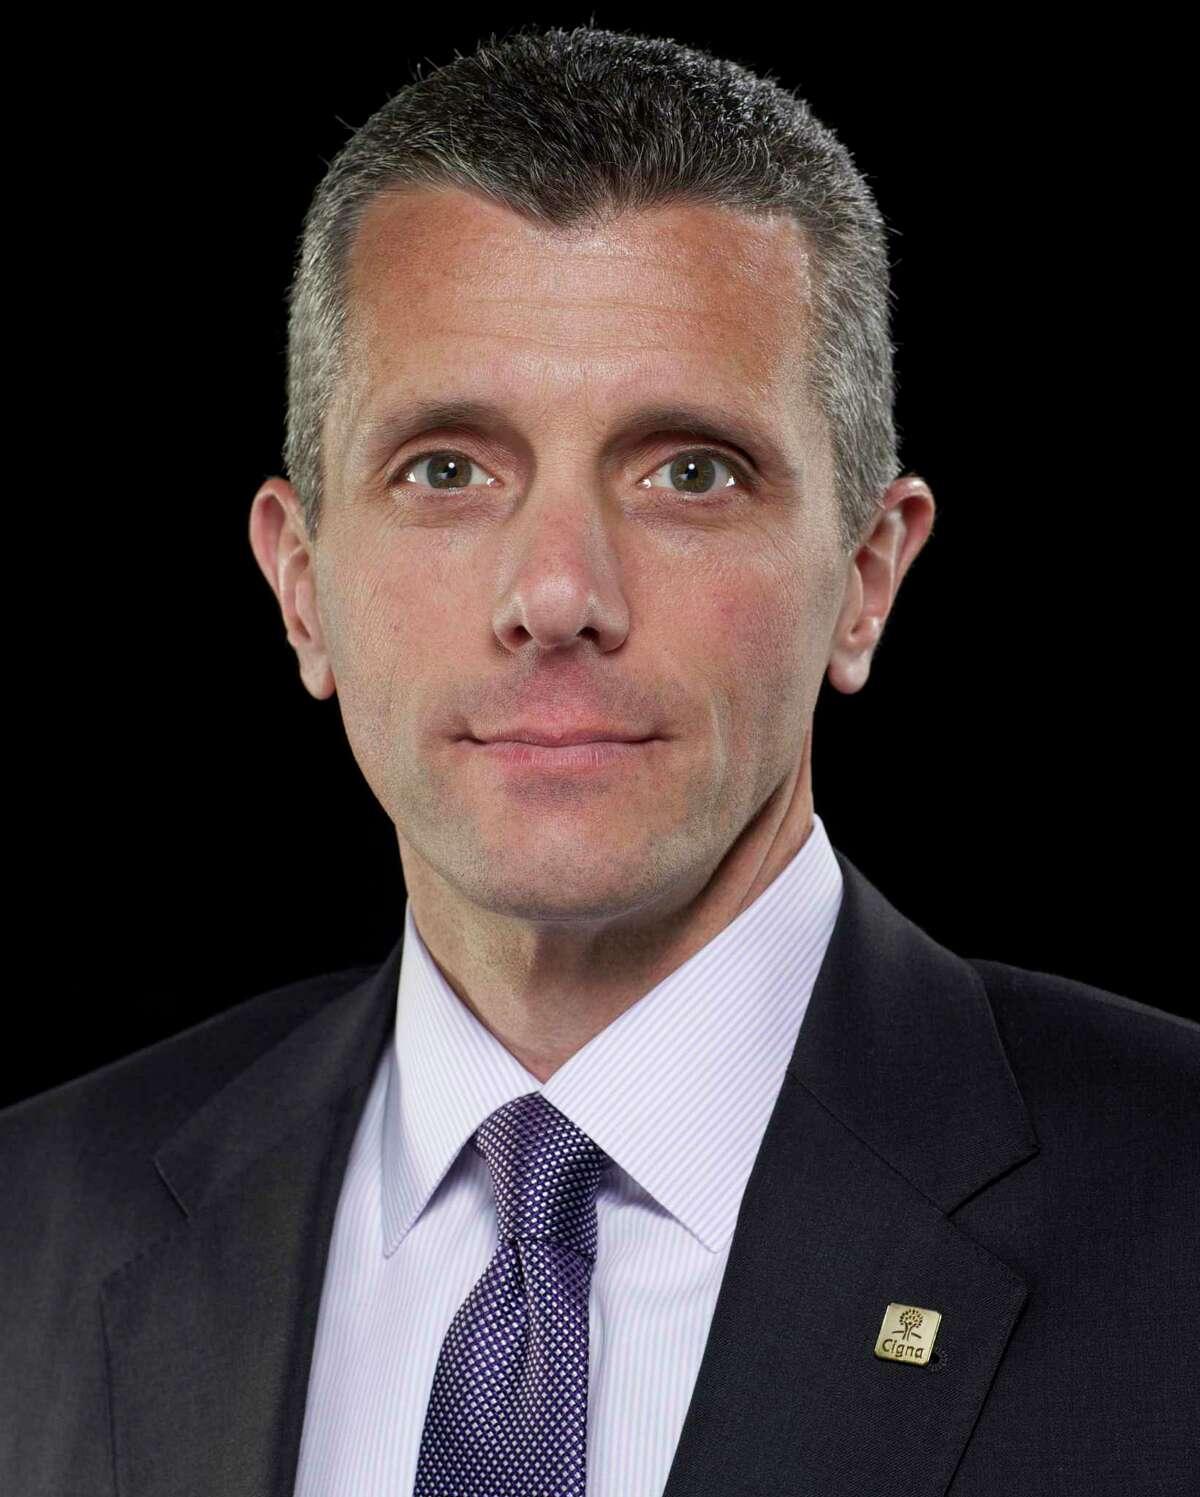 David Cordani is CEO and president of Cigna.